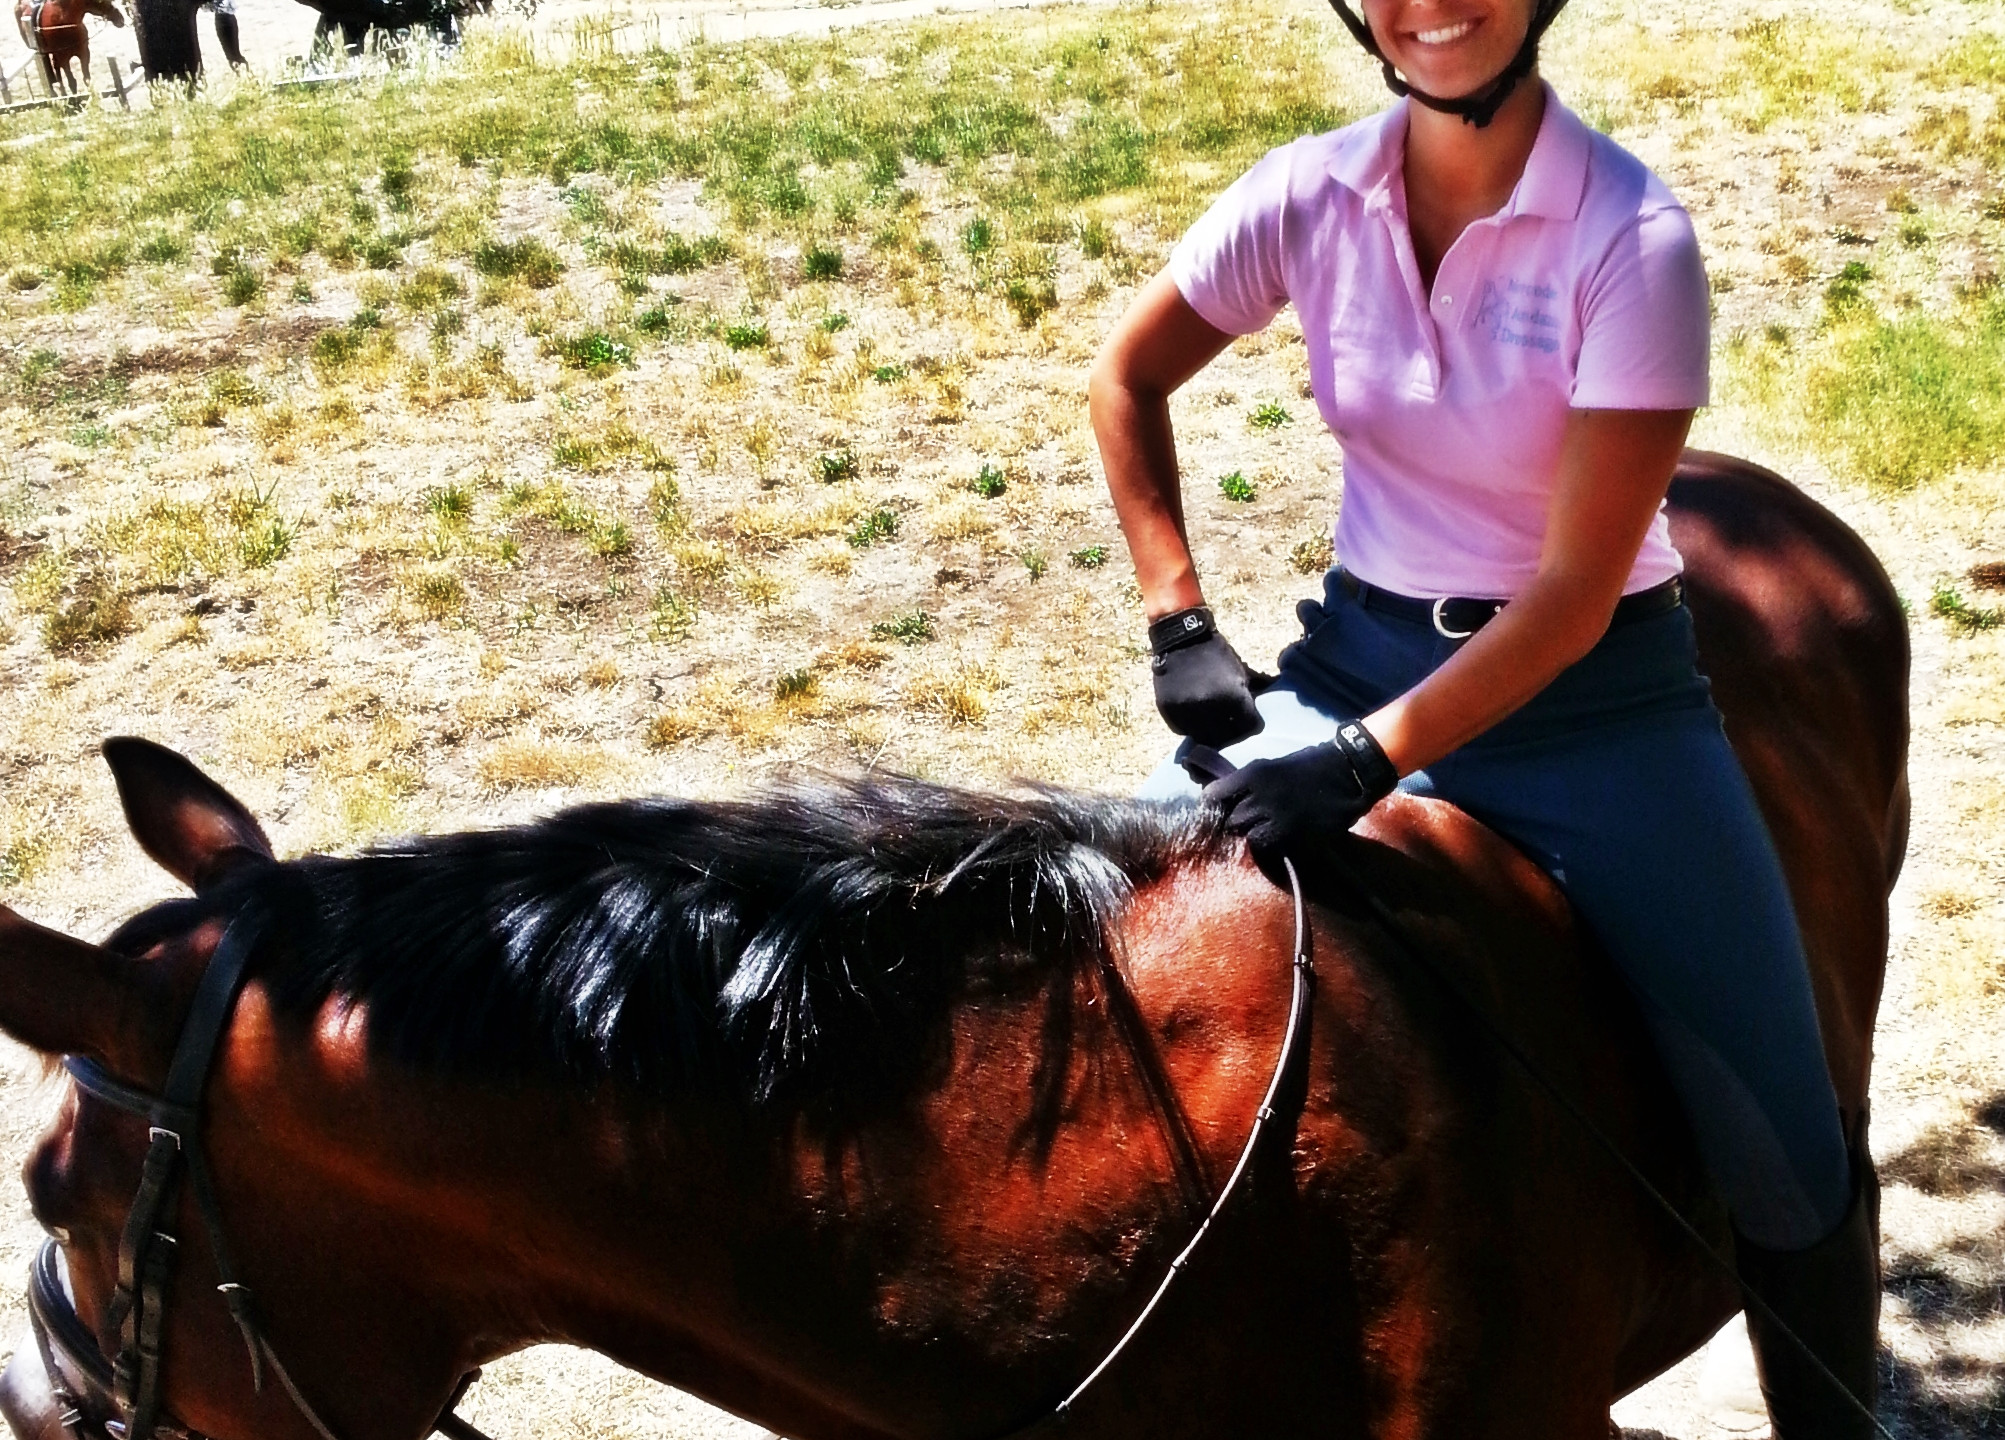 Mercedes Andazola Dressage Horse Trainer